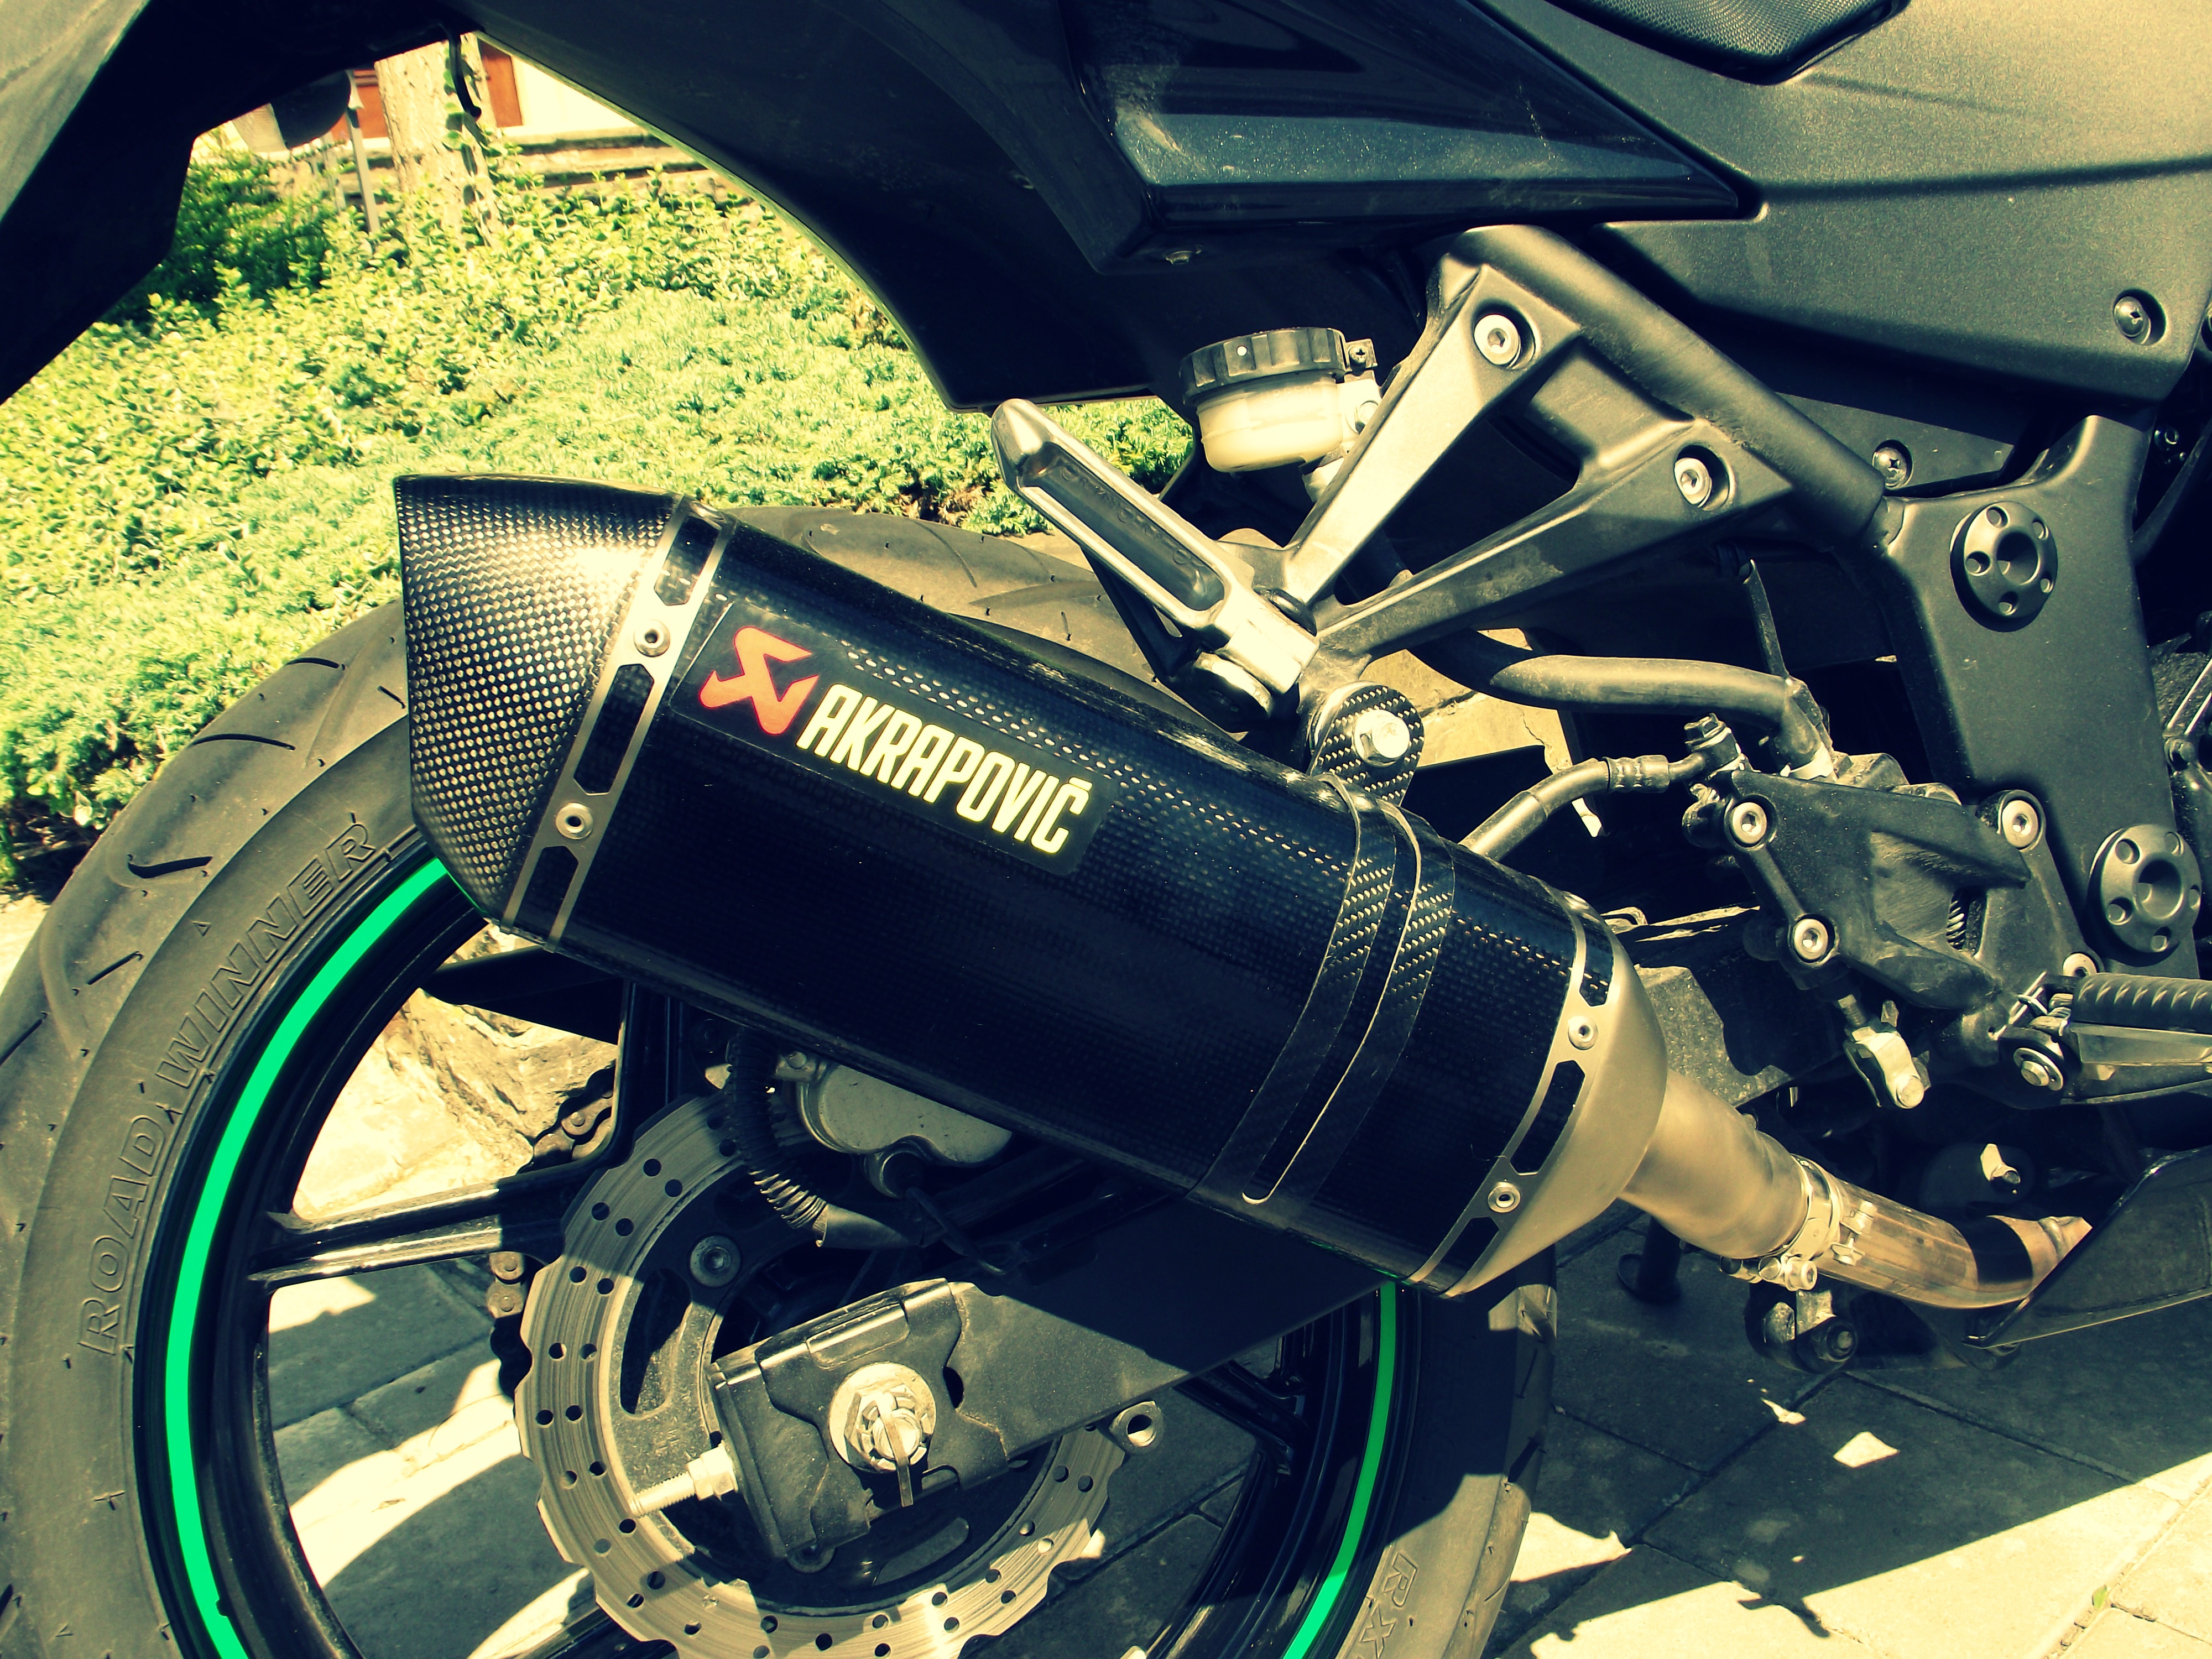 moto kawasaki pot akrapovic 3 by laurenthxc on deviantart